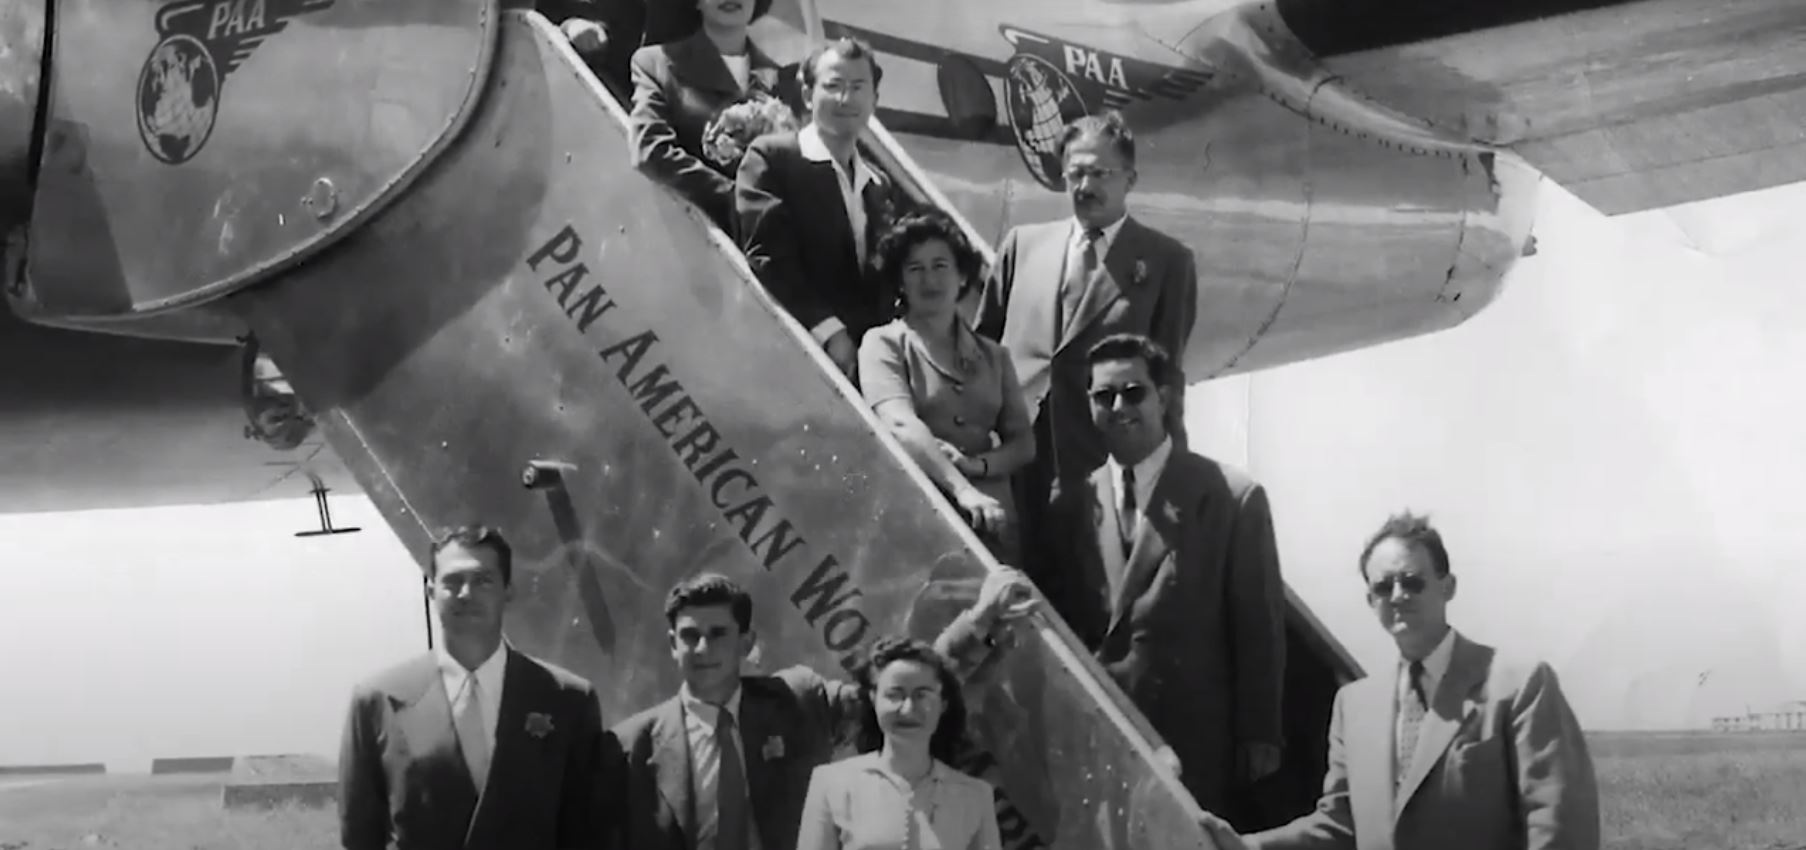 The Fulbright Program's 75th Anniversary 